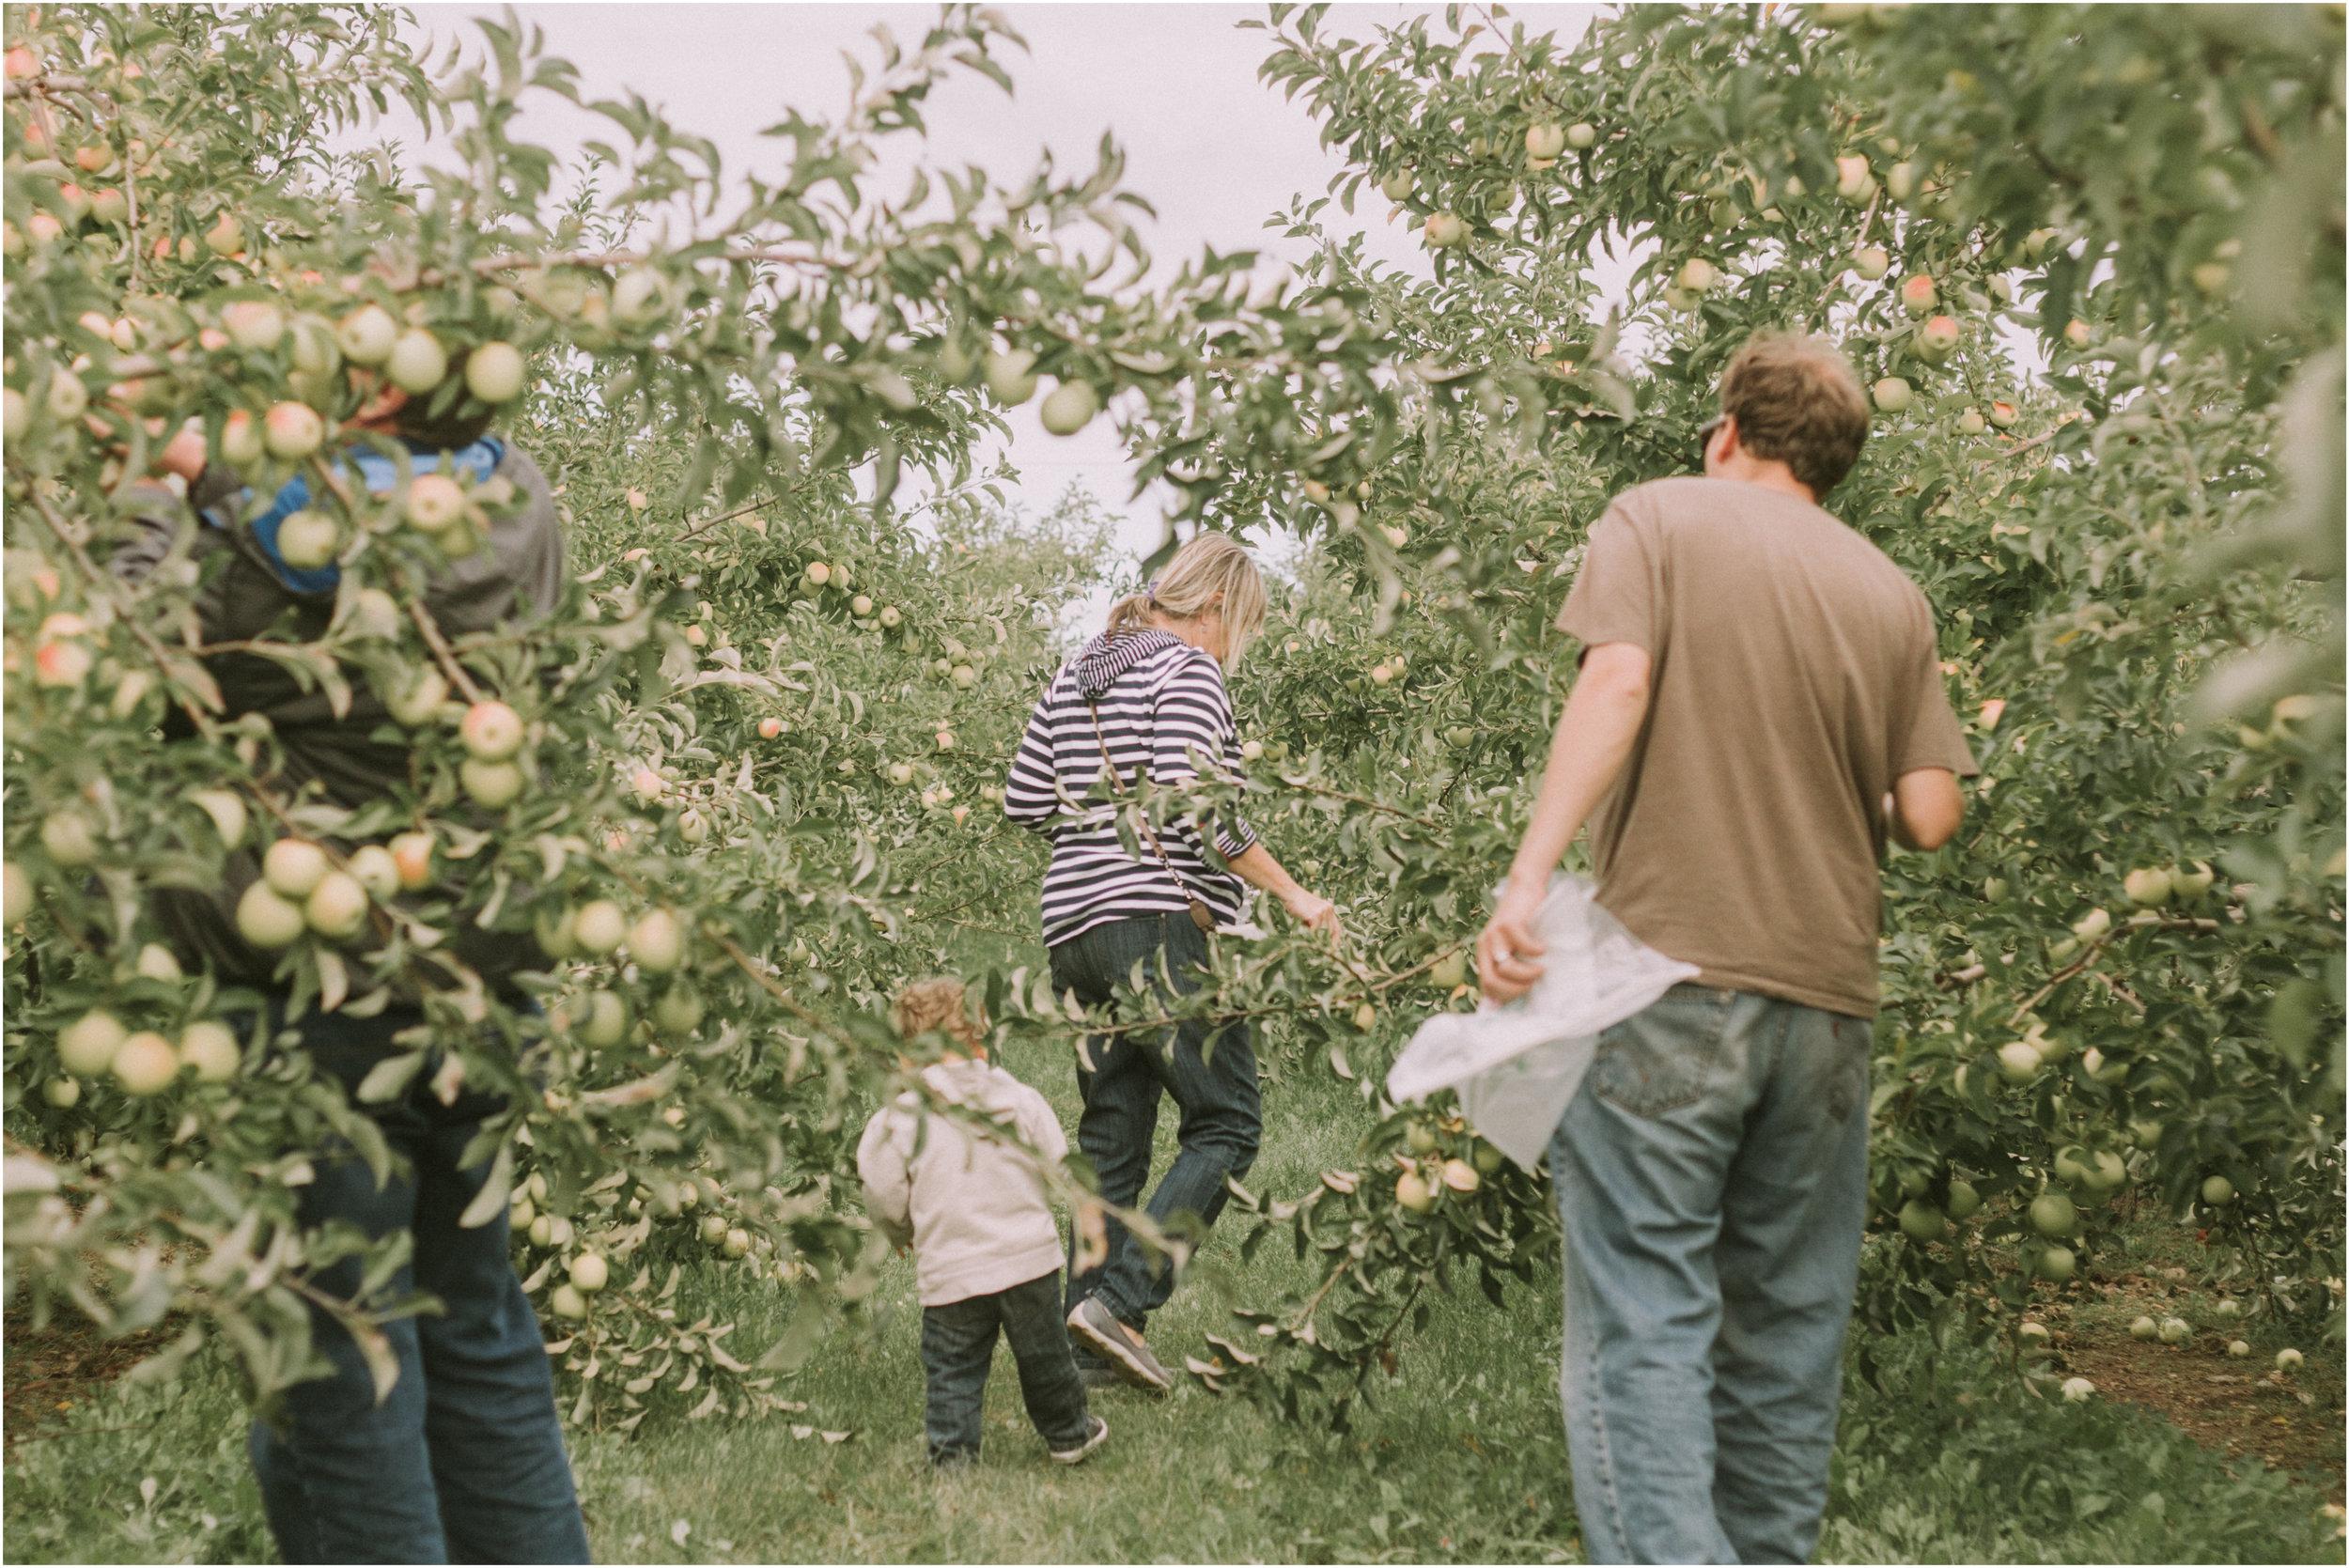 Wisconsin Apple Picking Documentry Photographer 9.jpg